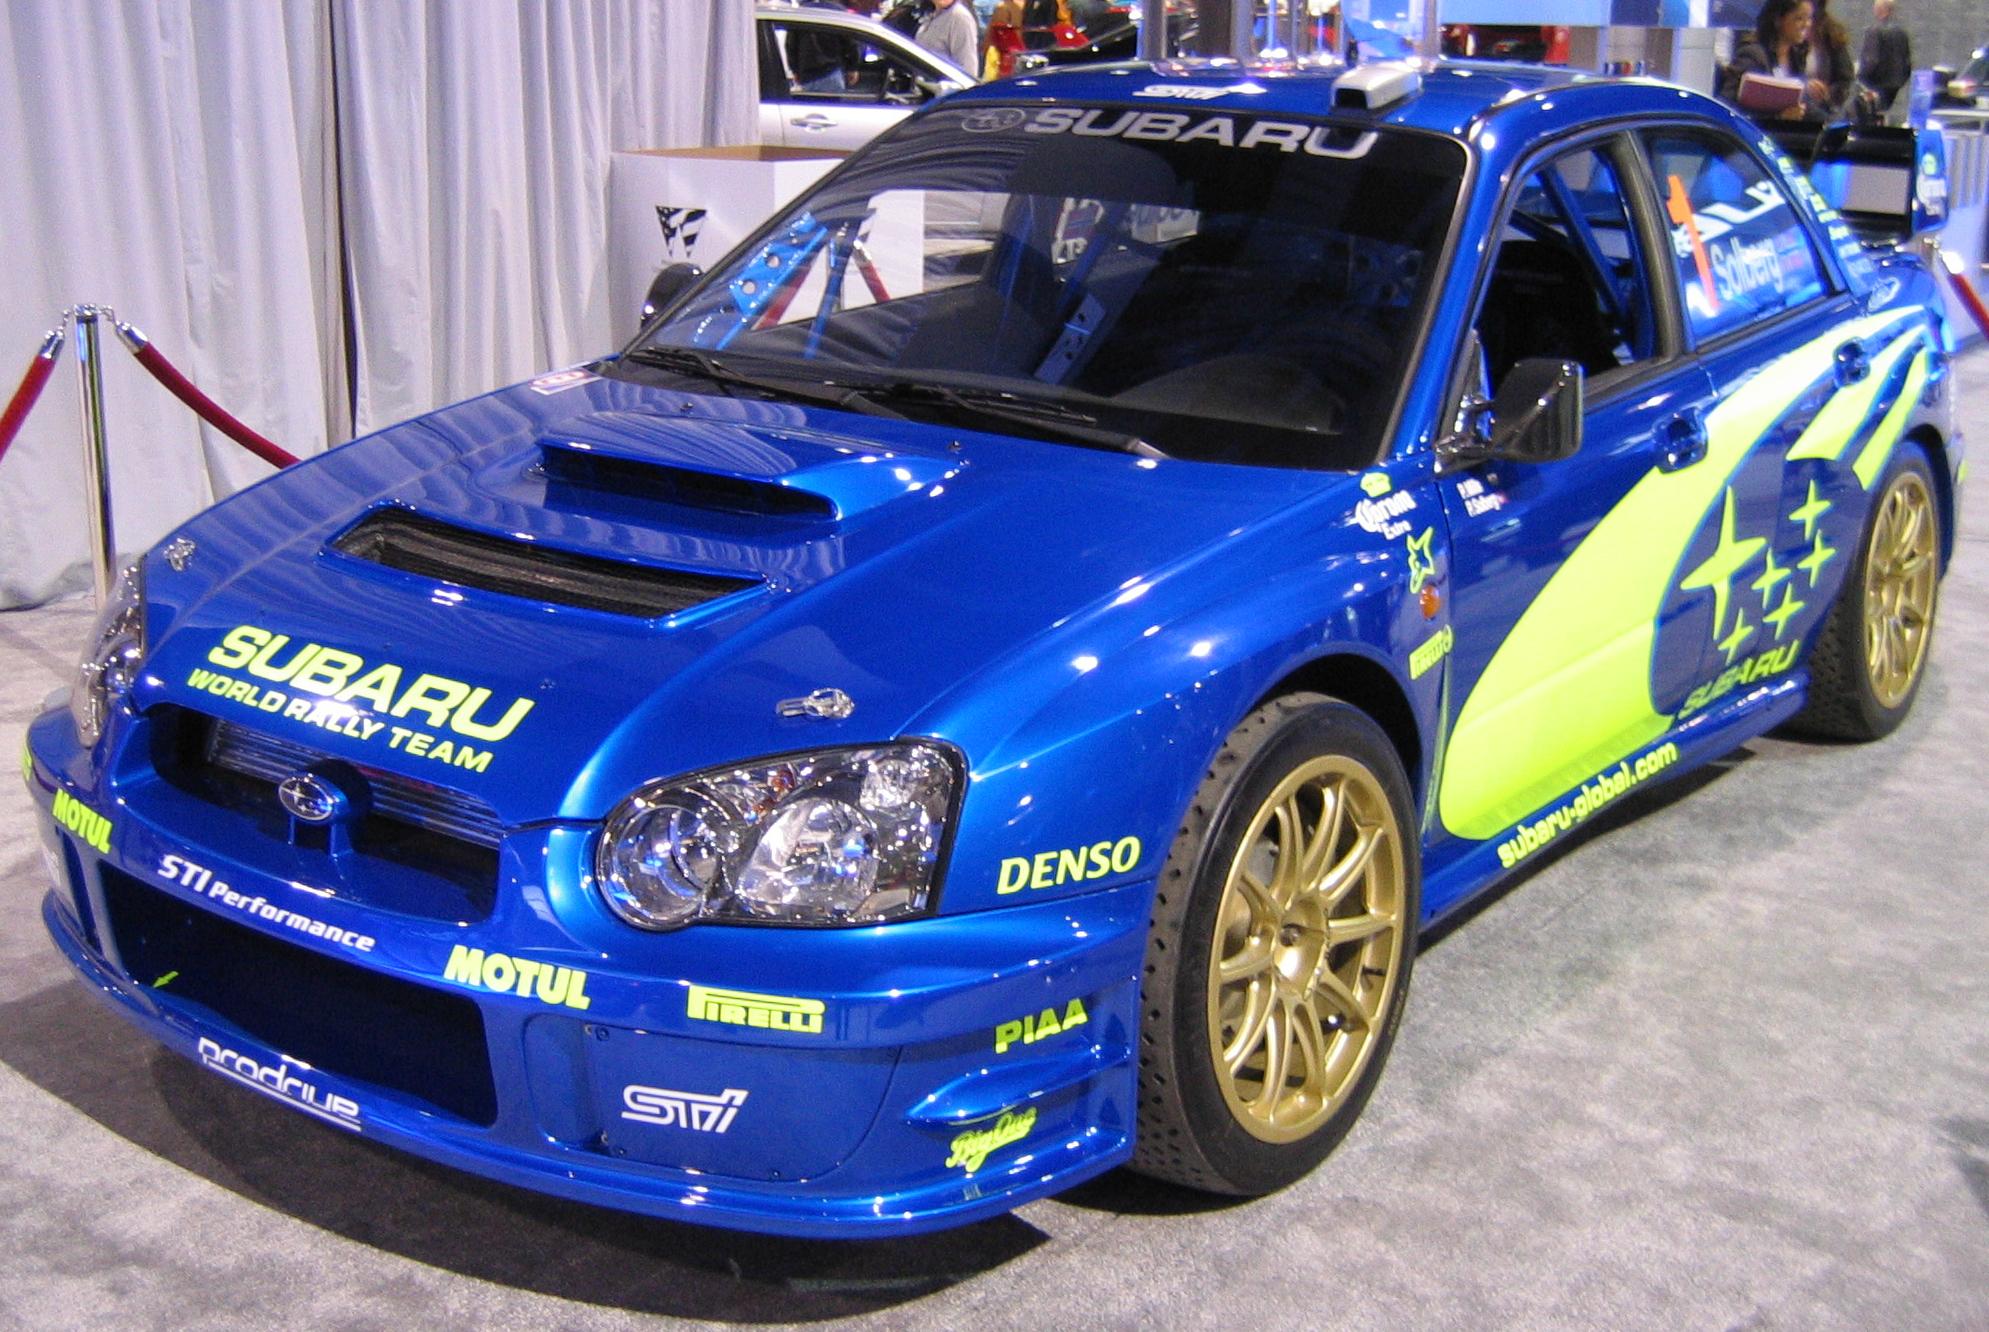 subaru wallpaper (Subaru Impreza)